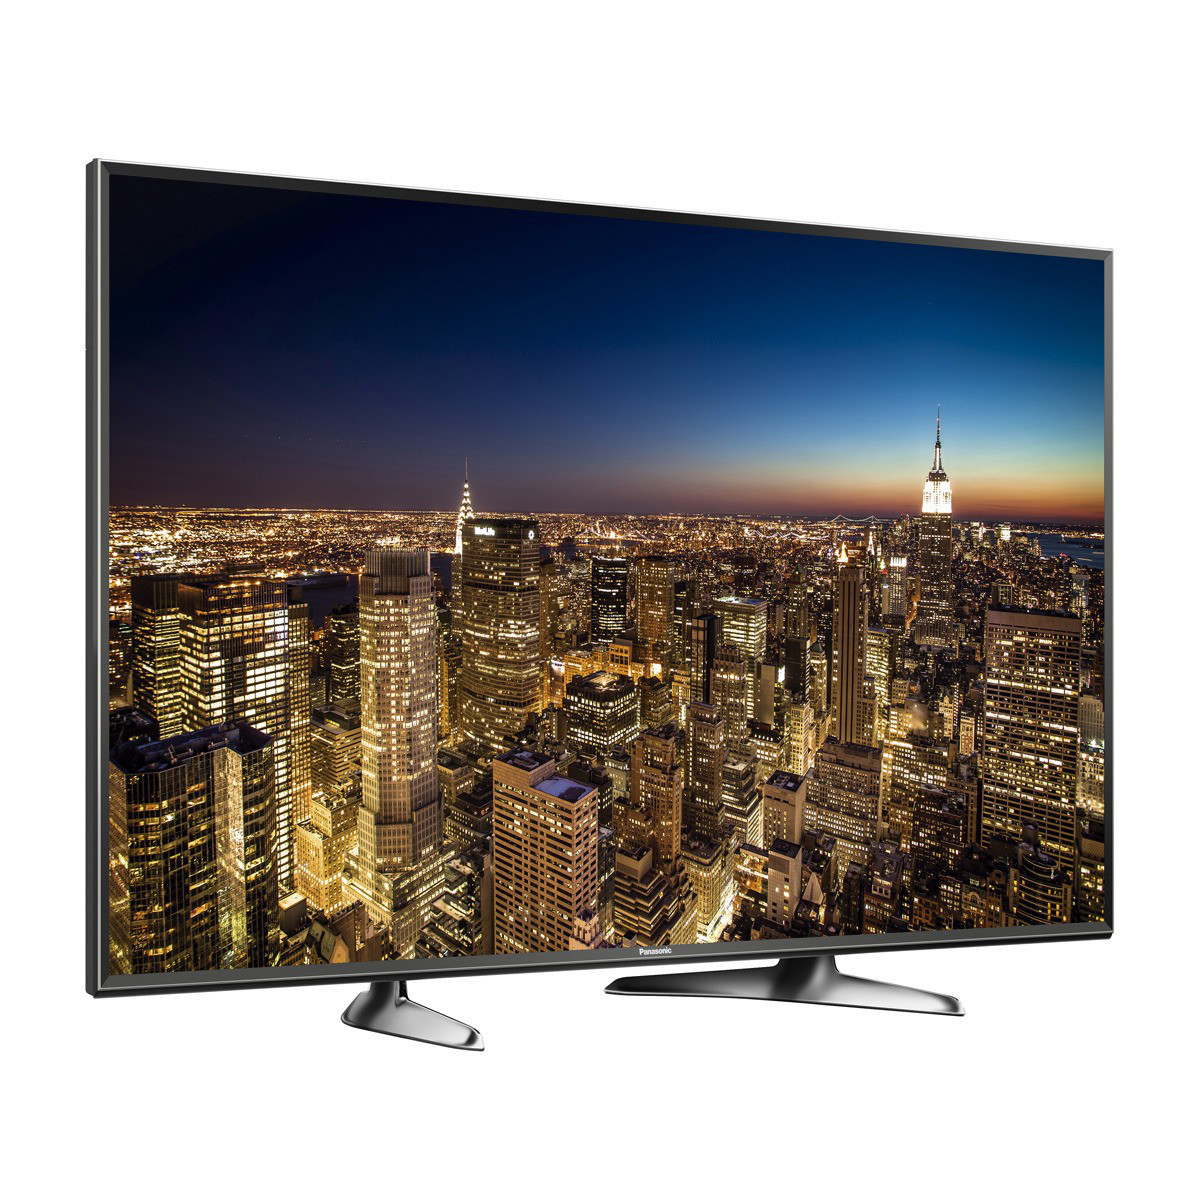 Телевизор Panasonic TX-49DXU601E (BPR1000Гц, UltraHD 4K, Smart TV, Wi-Fi, Dolby Digital Plus 2x10Вт, DVB-C/T2)